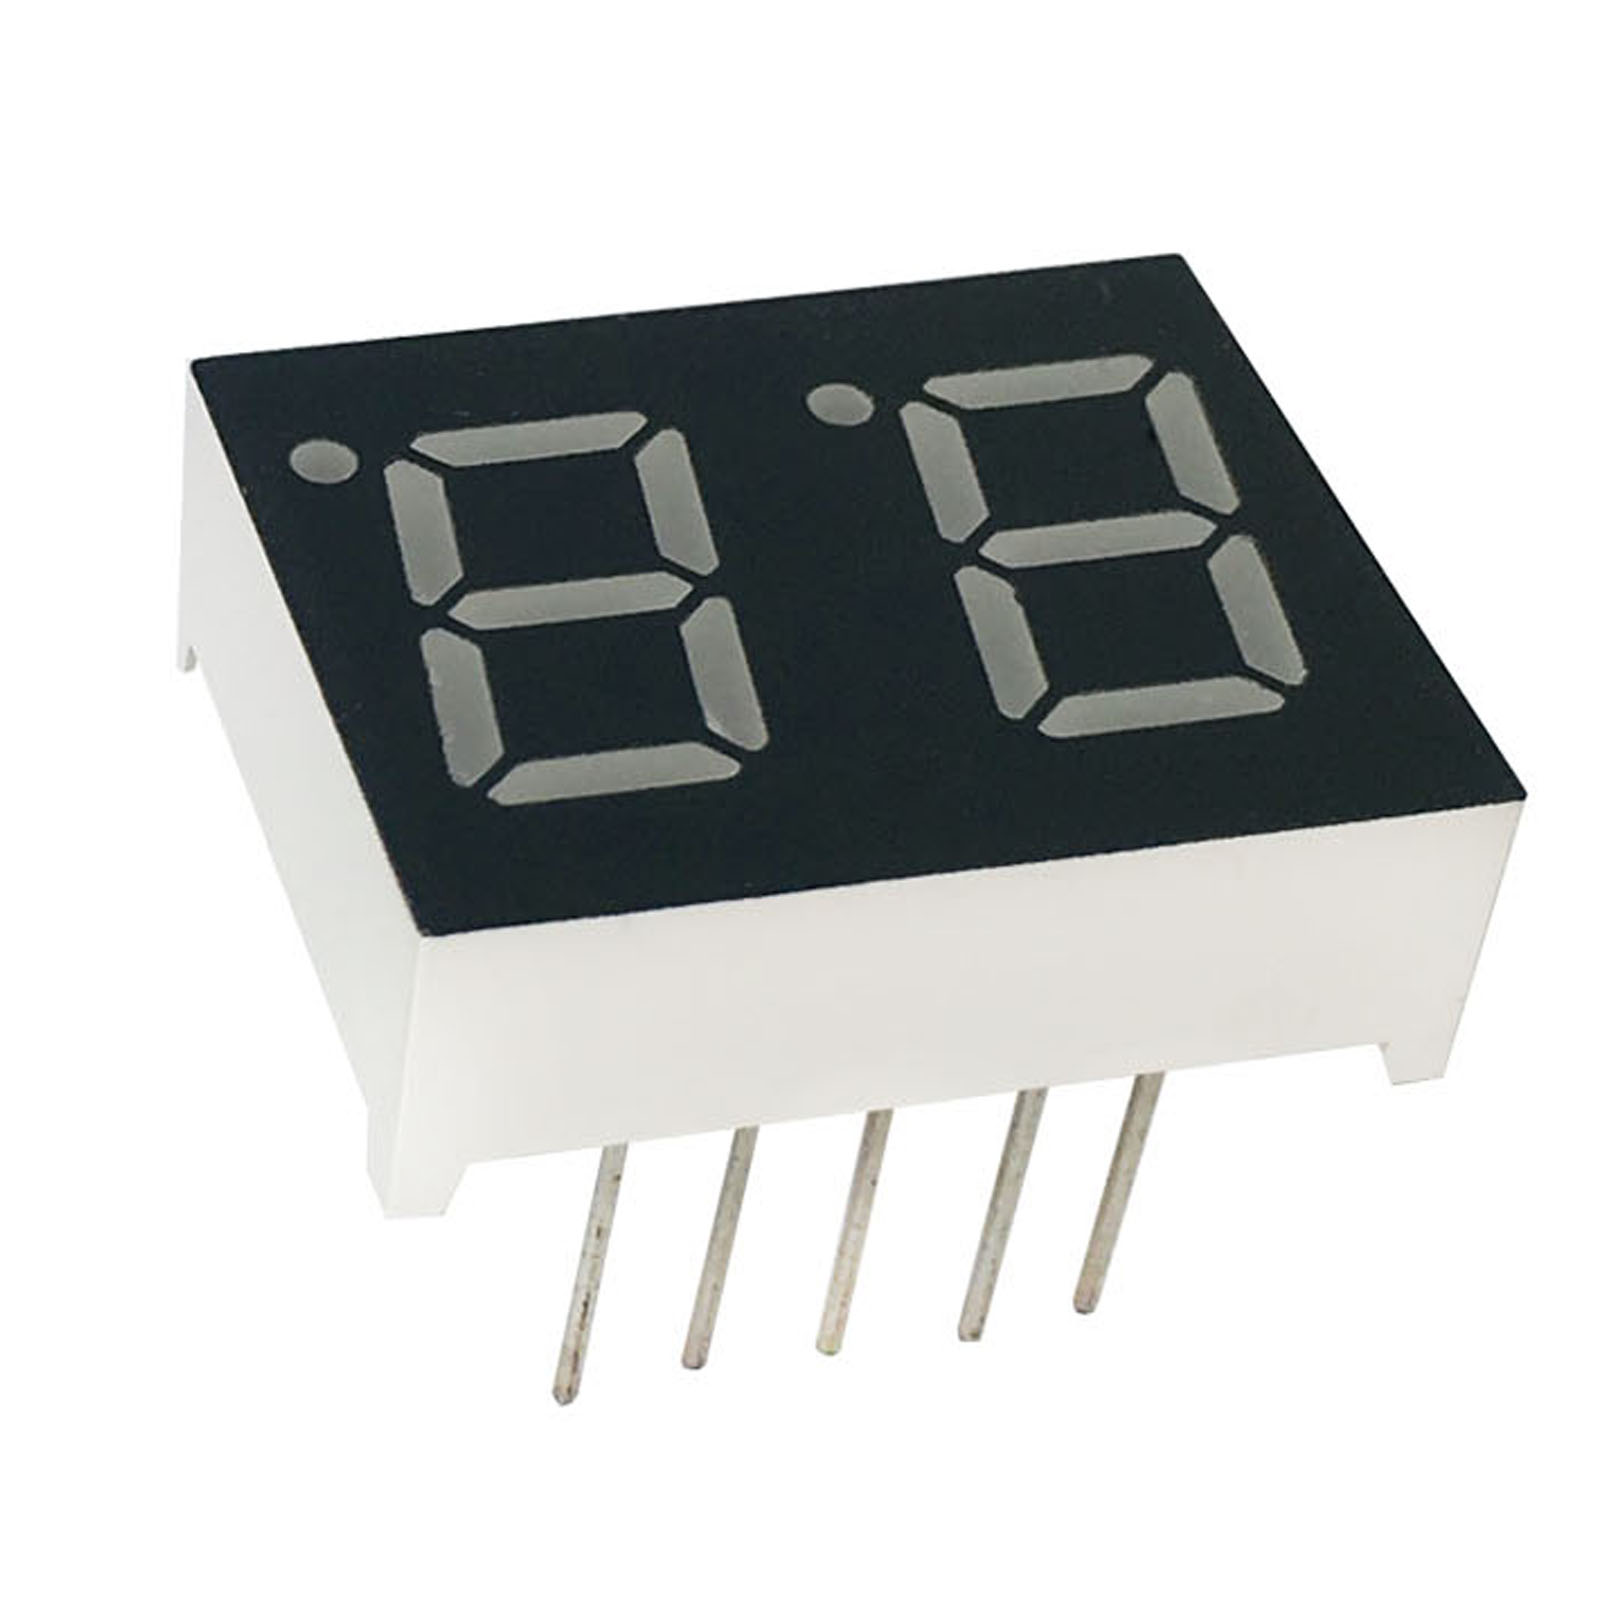 MCIGICM 100pcs 7 Segment Common Cathode 2 Bit Digital Tube 0.4